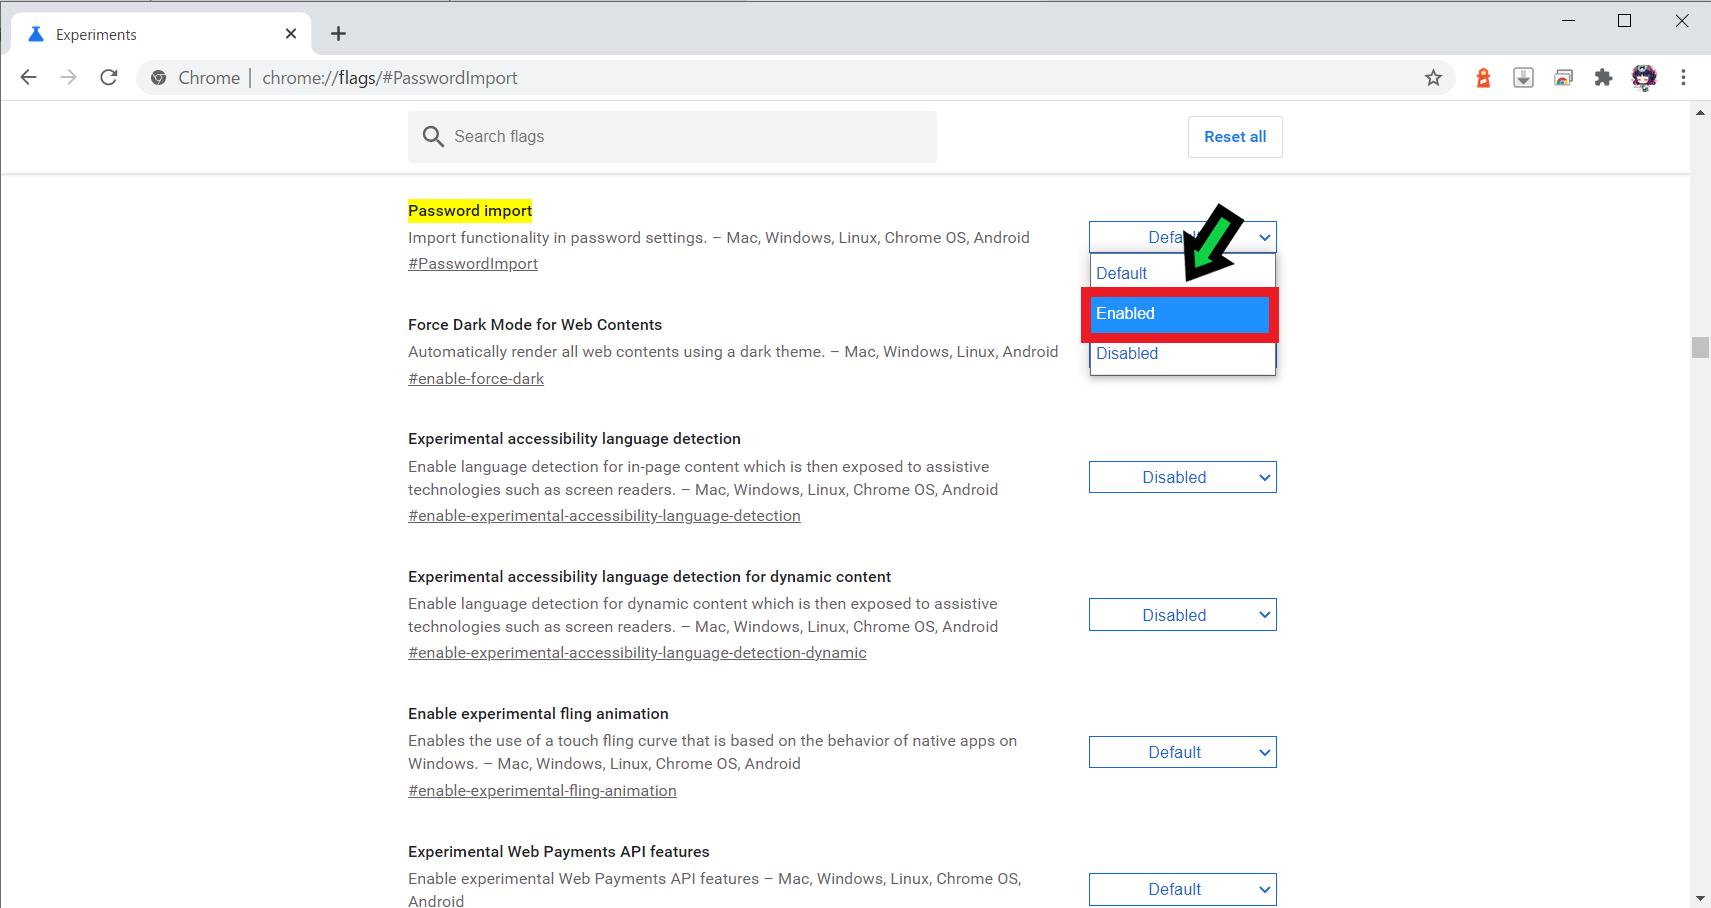 Password i【図で解説】Google ChromeのID、パスワード情報をエクスポートする方法【クロームのパスワード移行】mport